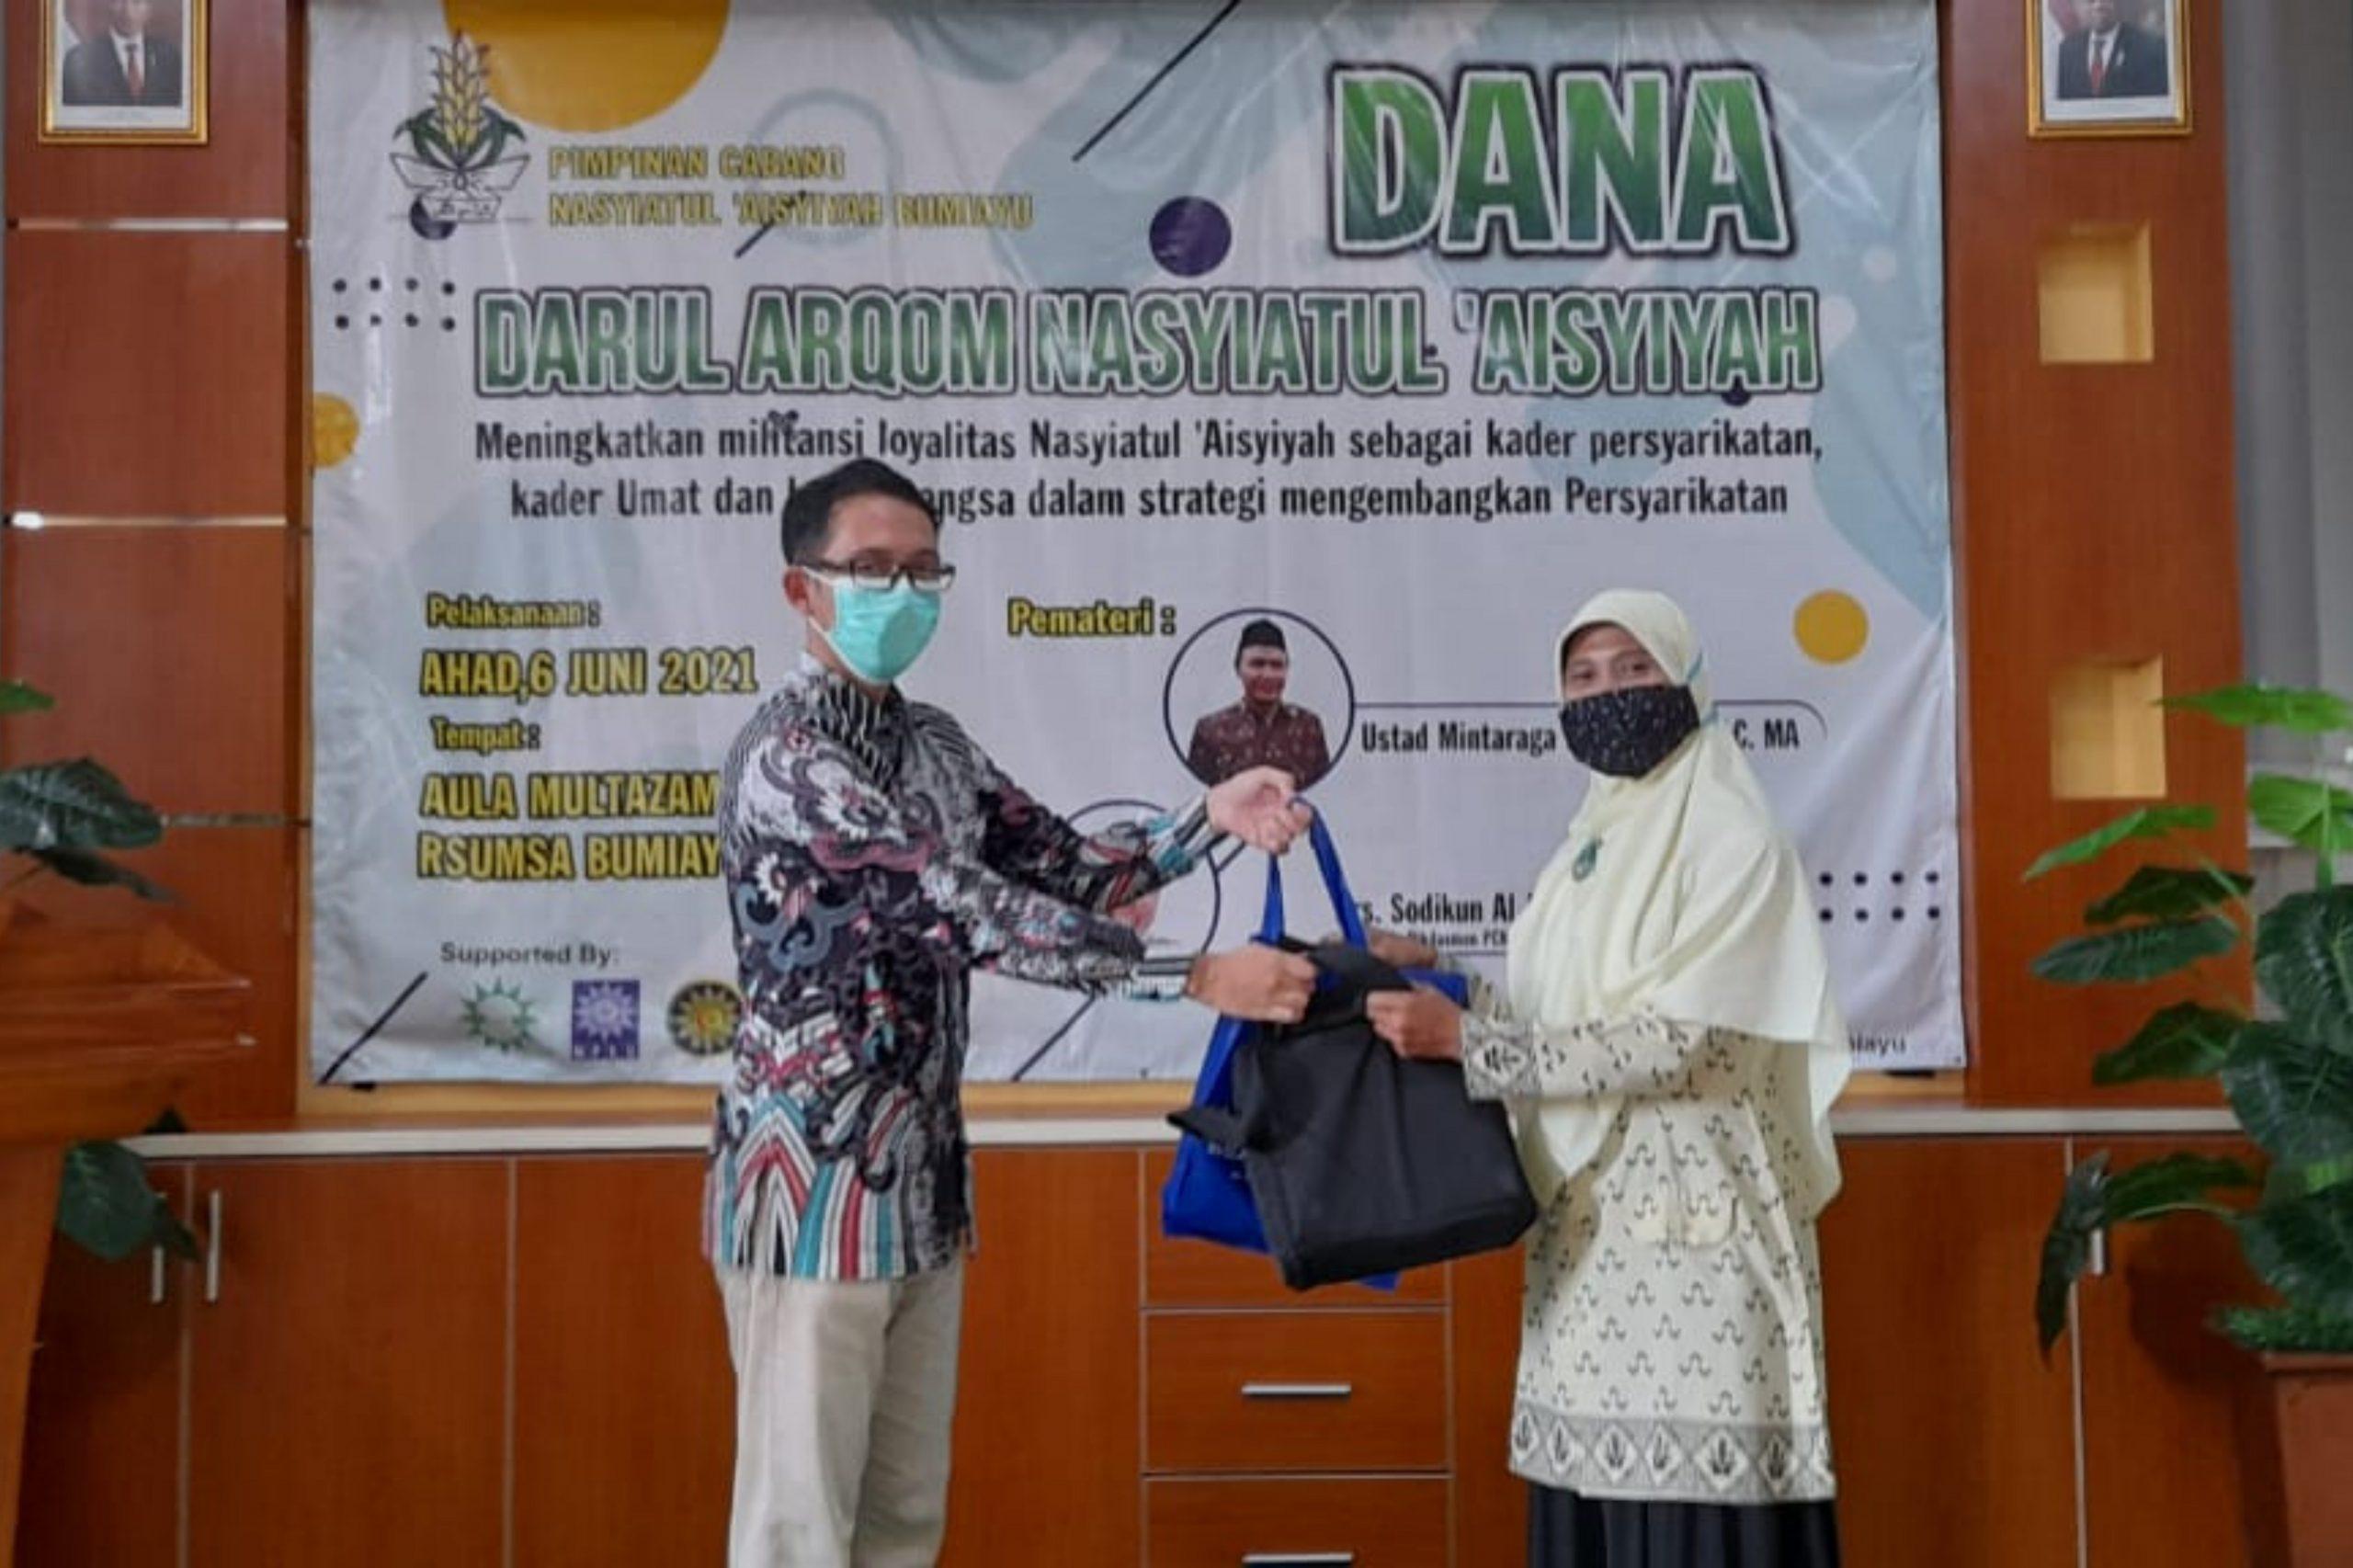 Acara DARUL ARQAM NASYIATUL AISYIYAH I (DANA I)  di RSU Muhammadiyah Siti Aminah Bumiayu